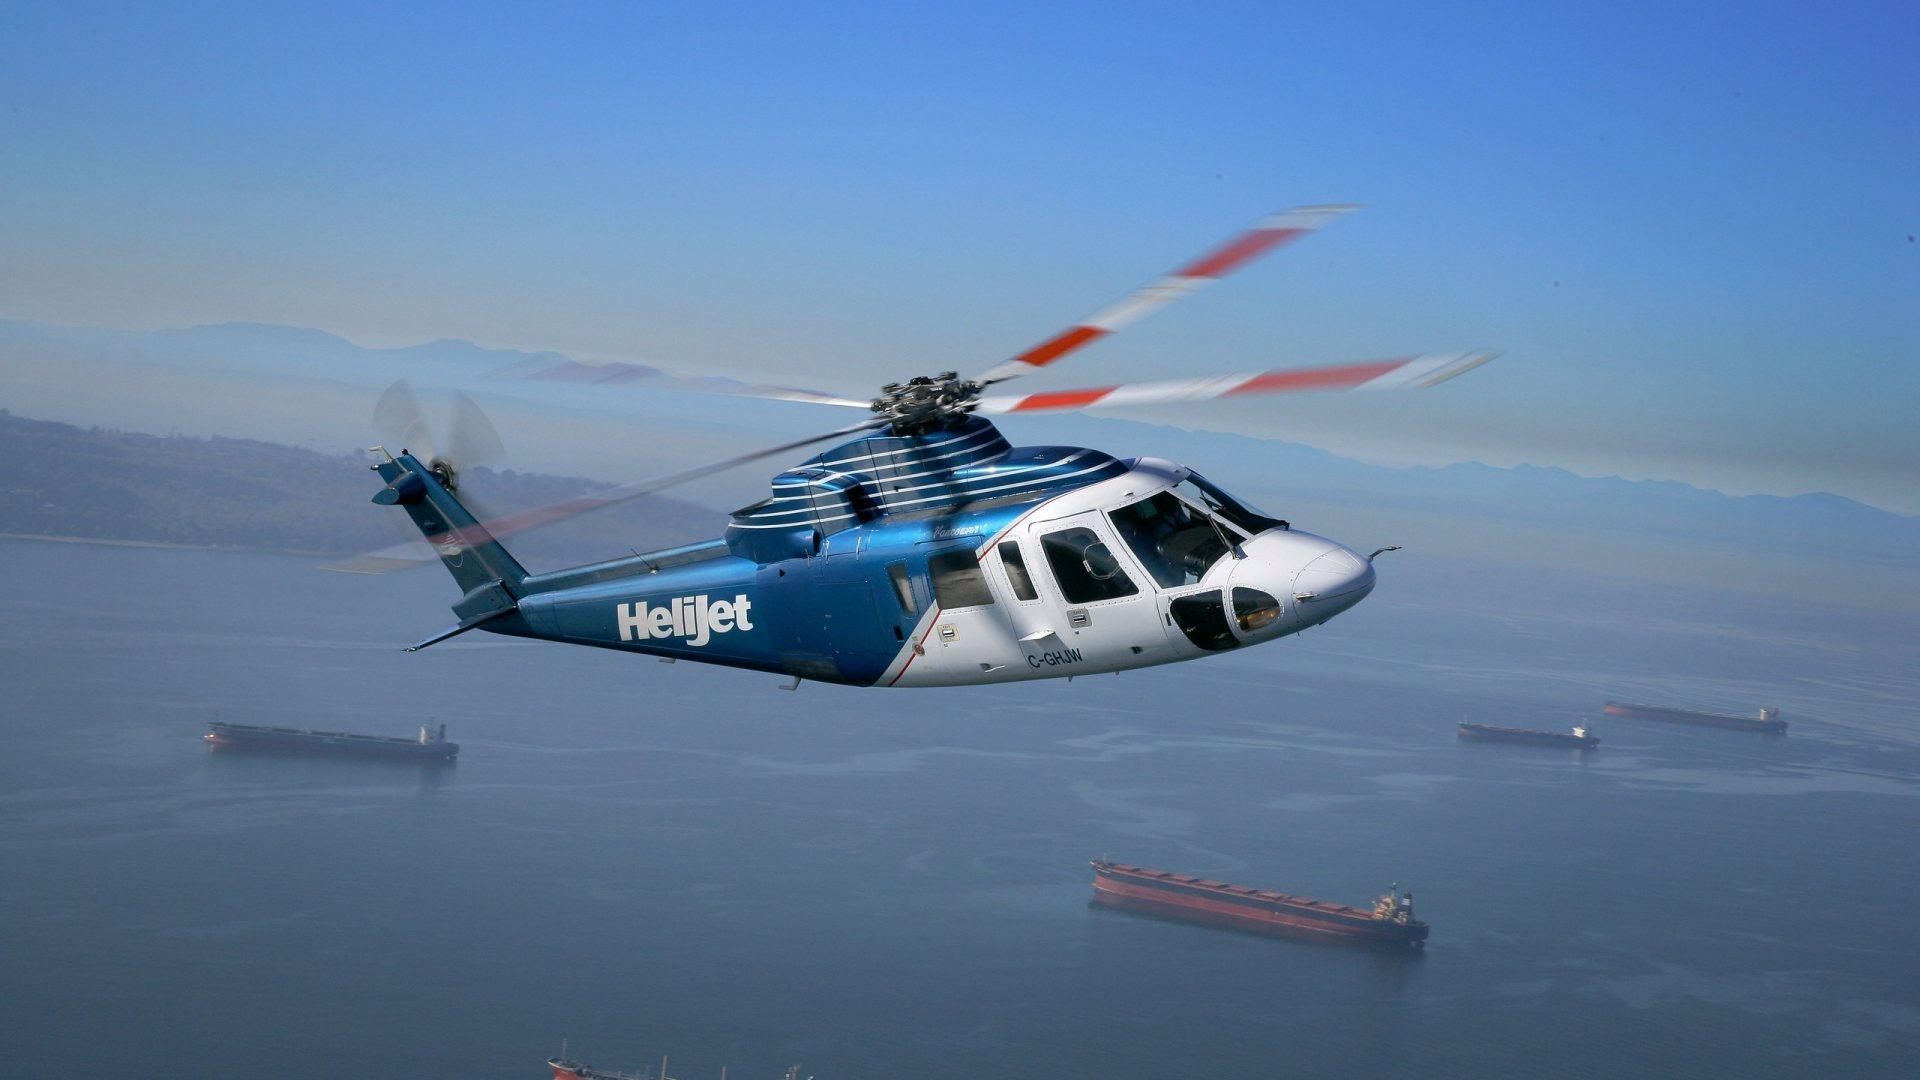 Aircraft Stunts 4K HD Desktop Wallpaper for 4K Ultra HD TV Dual